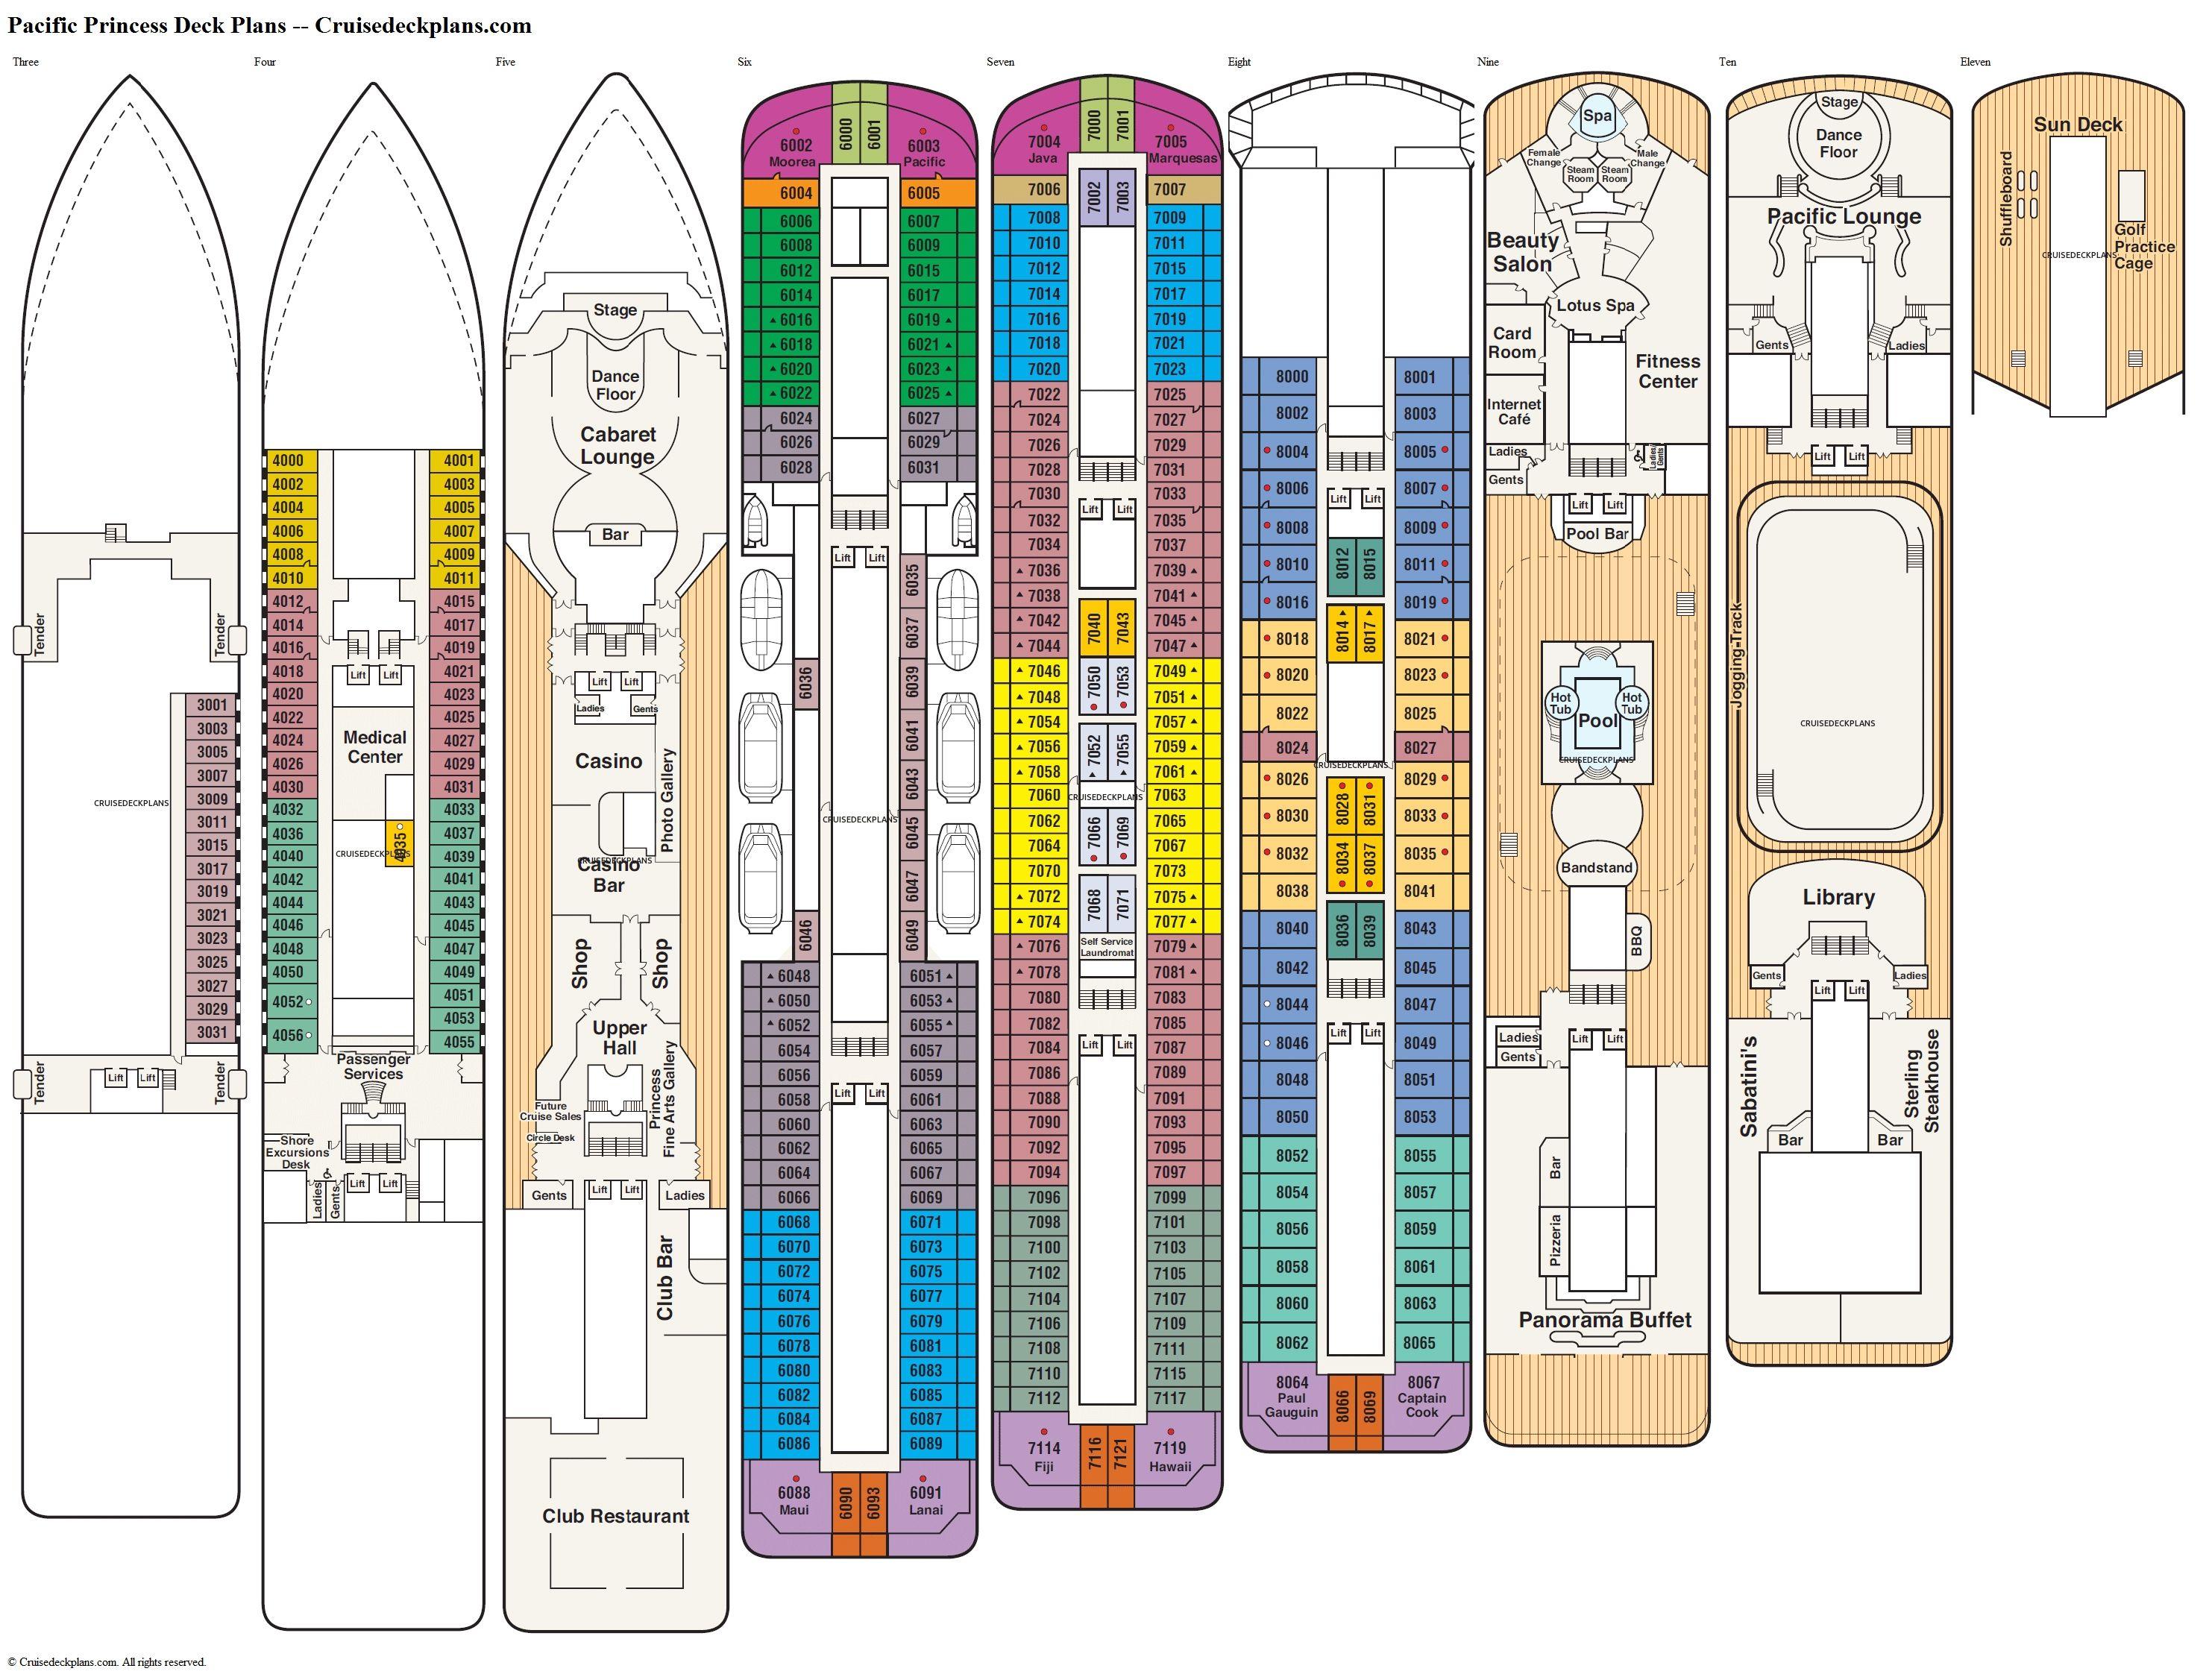 ruby princess ship diagram wiring diagram schematicsruby princess ship diagram wiring diagrams \\u2022 ruby princess dolphin deck ruby princess ship diagram